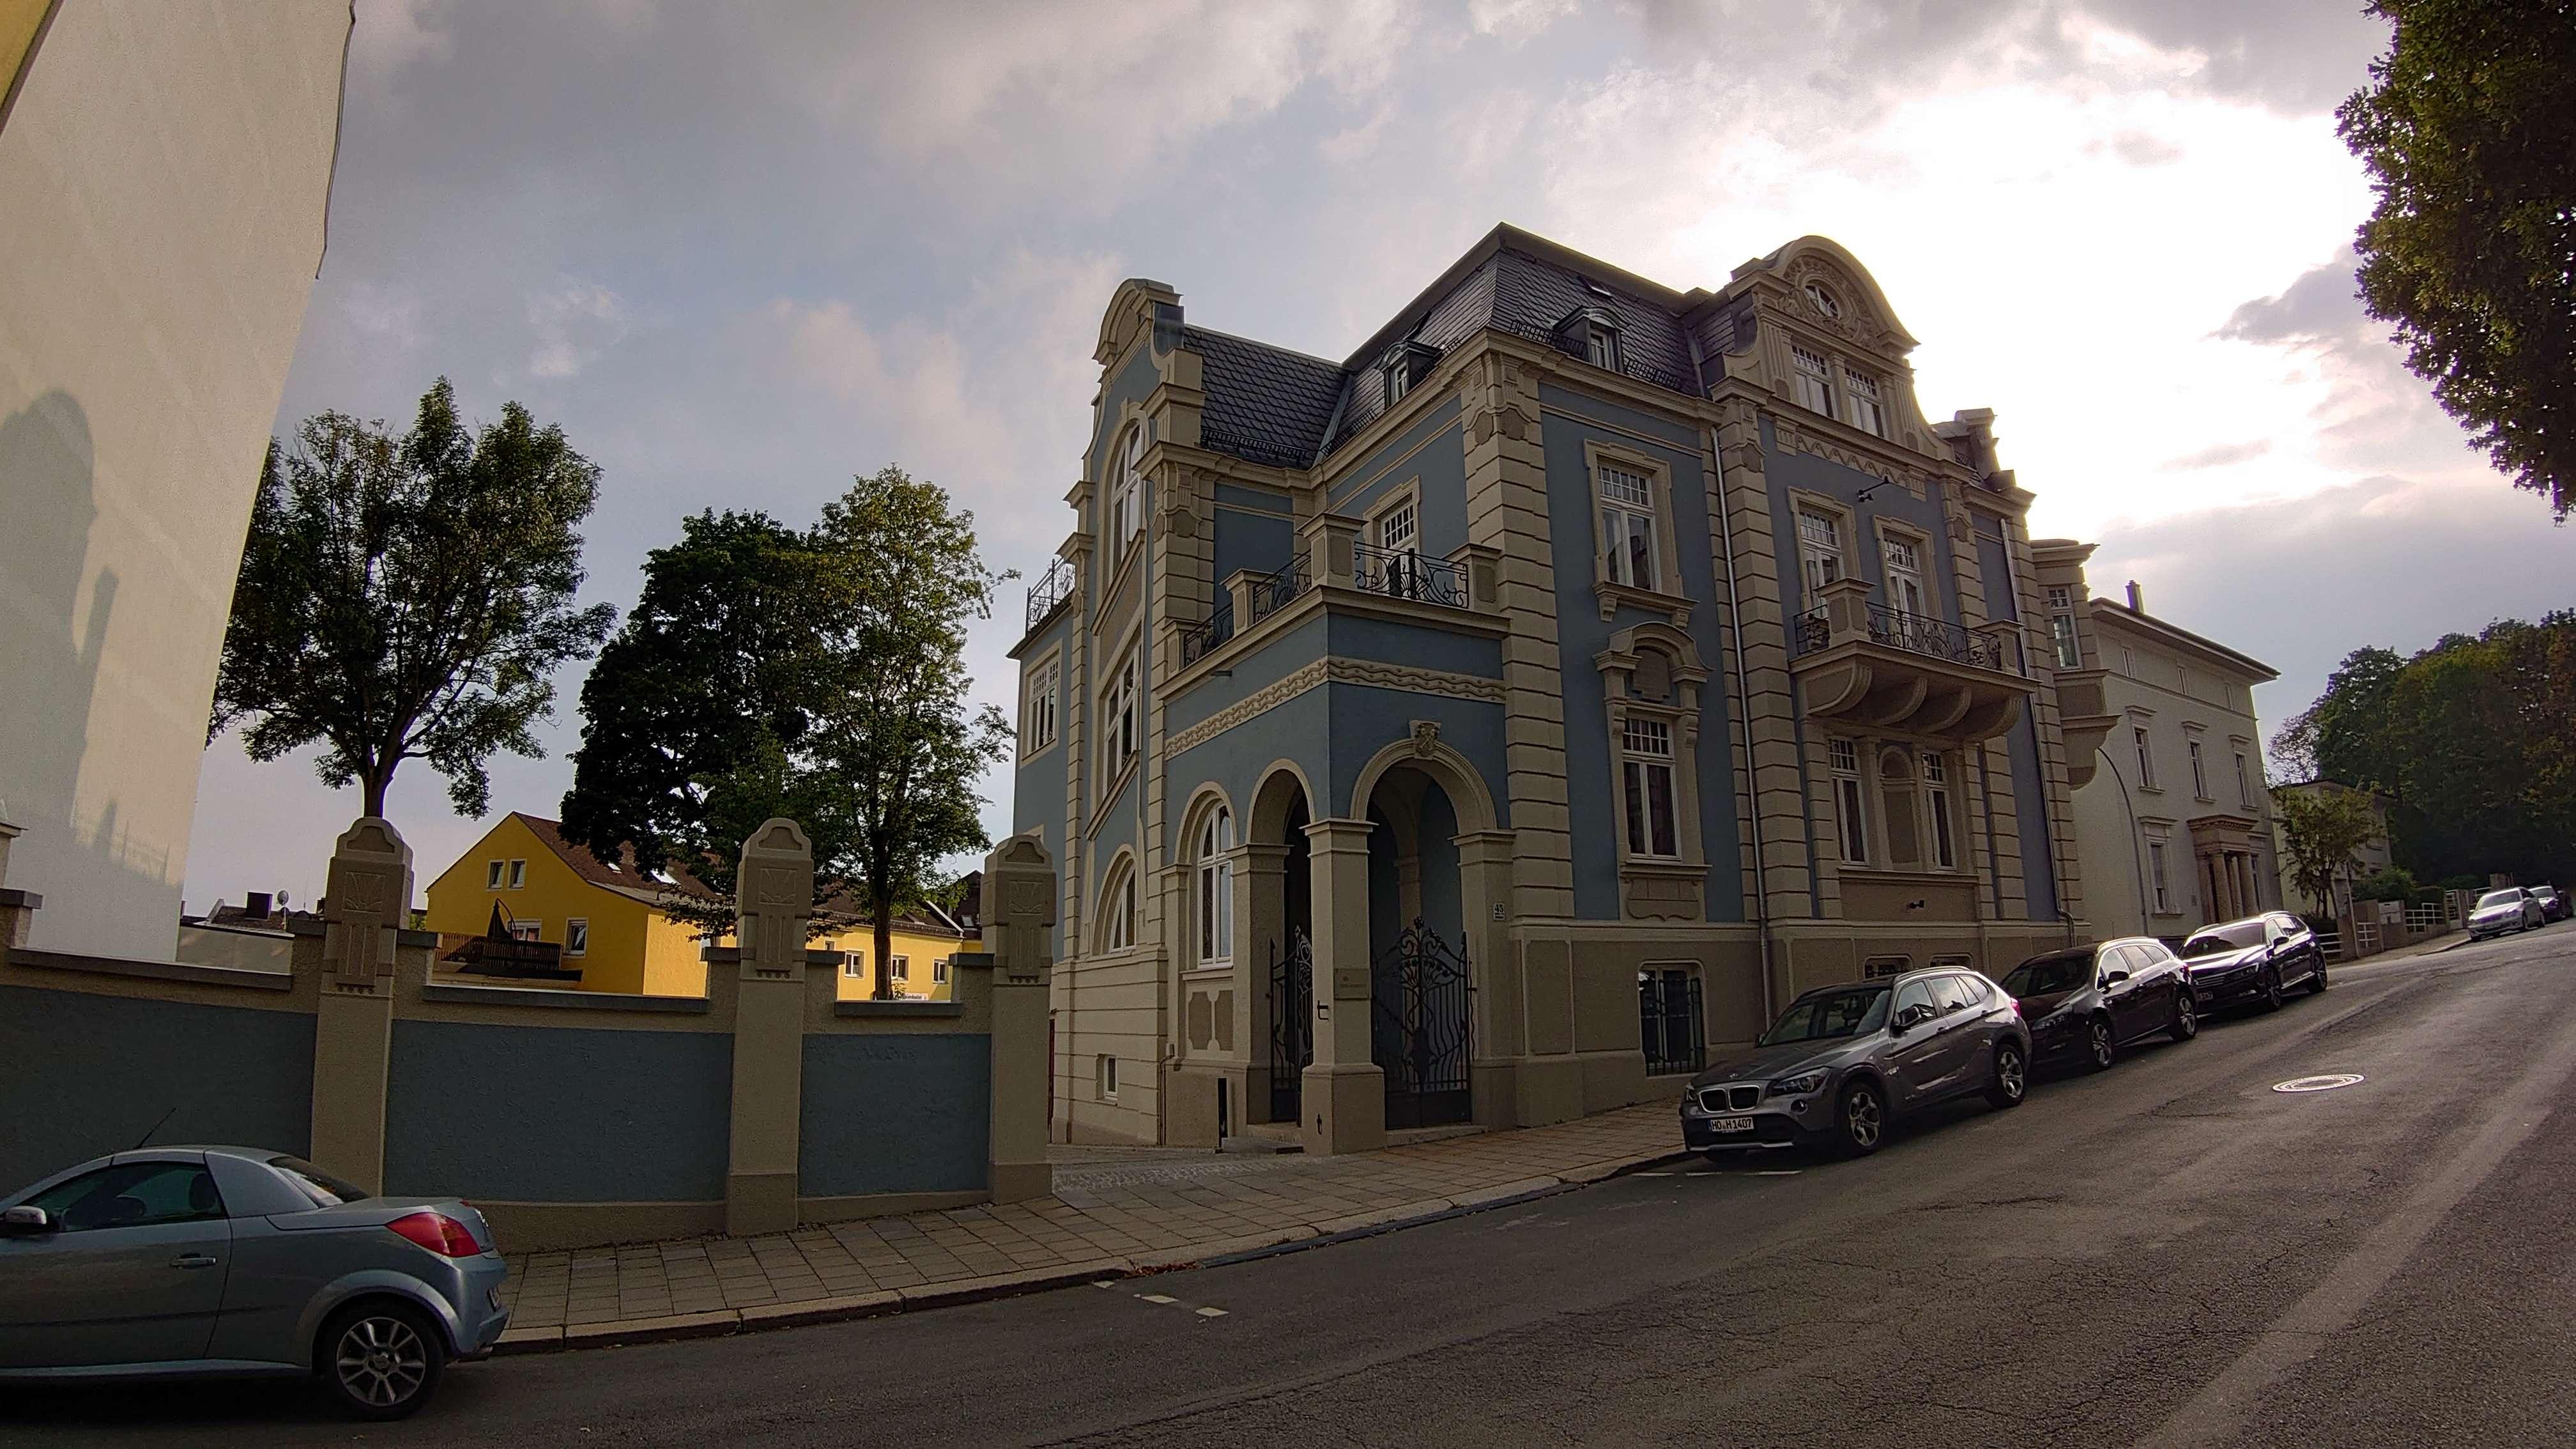 Aufwendig sanierte Jugendstil-Wohnung in Hof/Saale, Innenstadt in